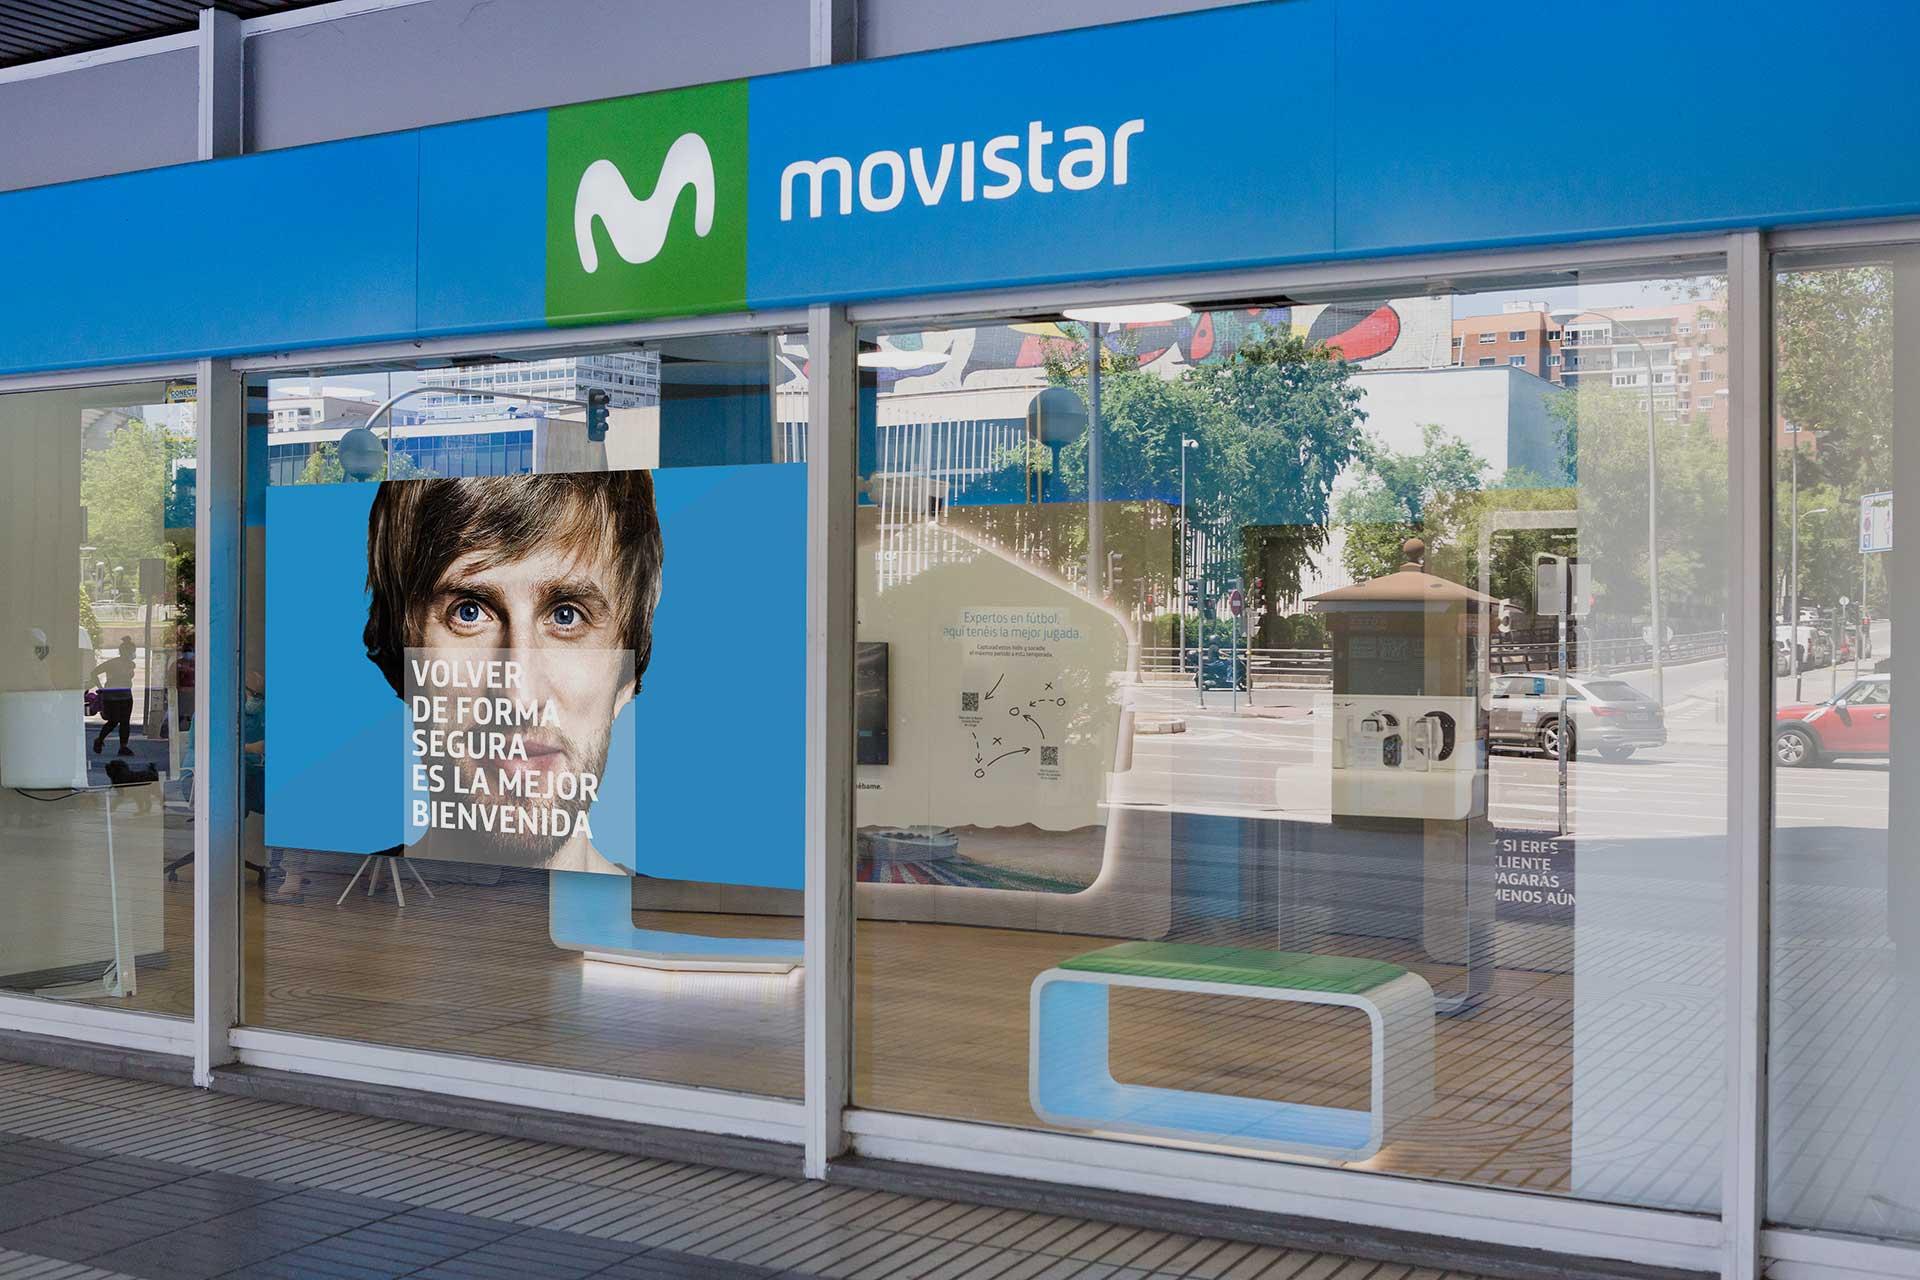 Movistar Contrato XL, características, detalles y letra pequeña